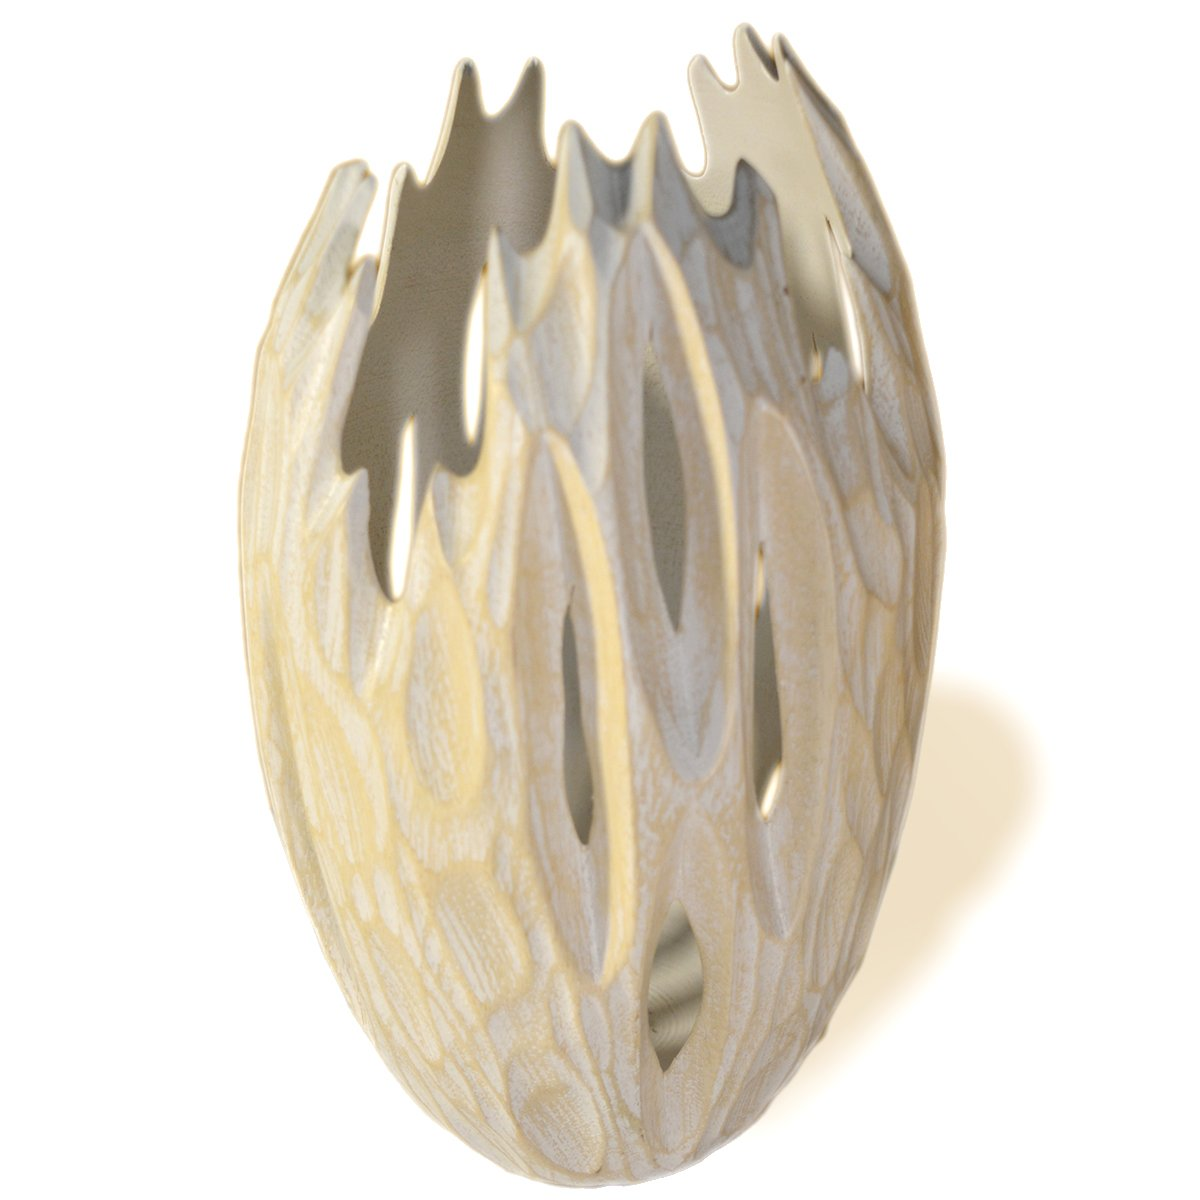 Roro Minimalist Handcarved Wood Vase with Upward Grooves (Whitewash)